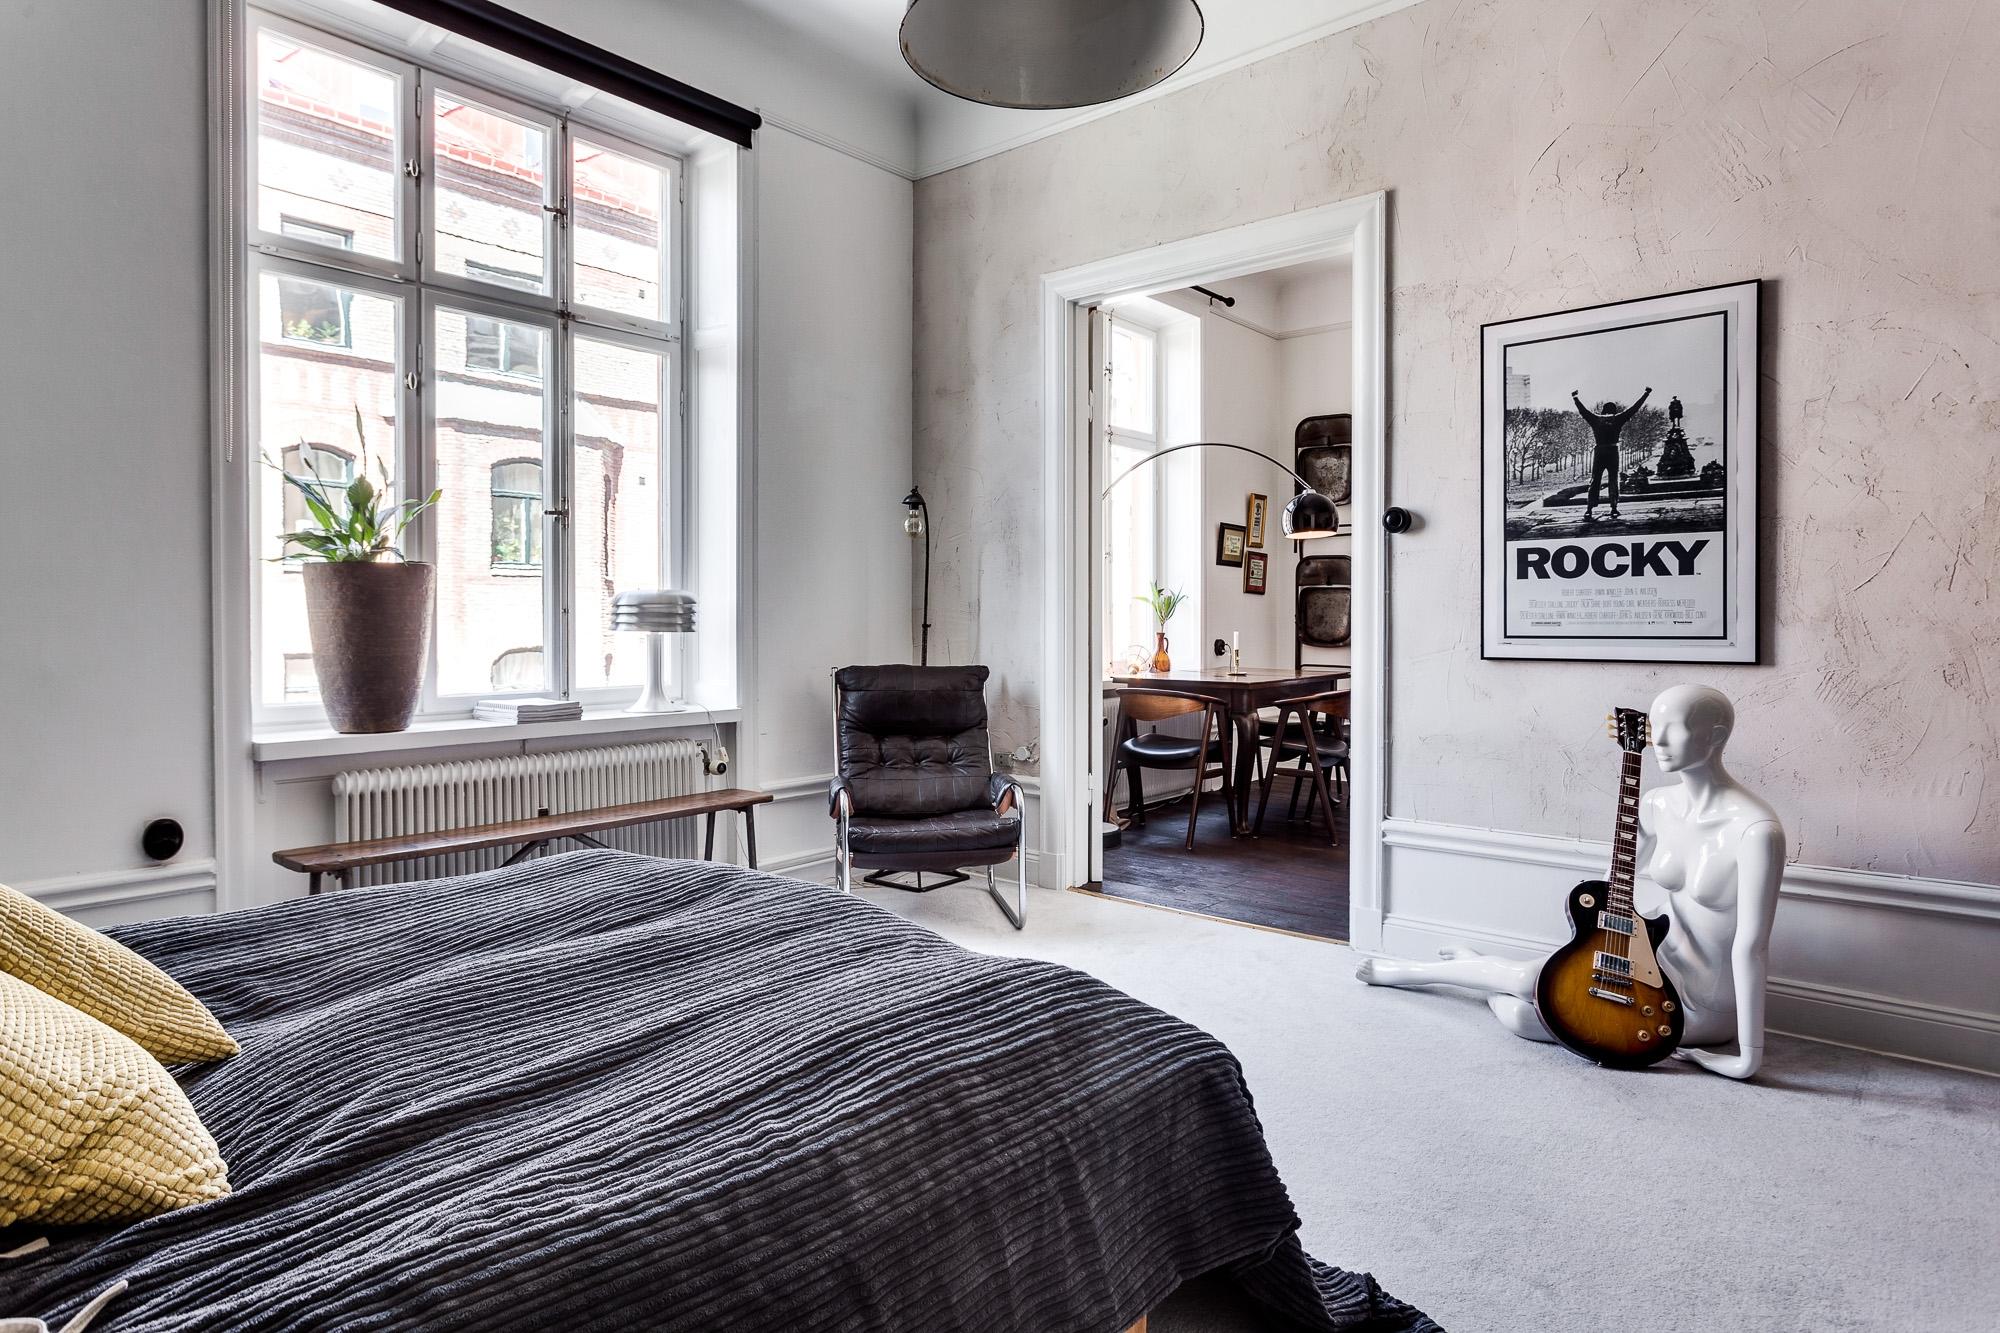 Industriele Slaapkamer Ideeen : In deze vintage slaapkamer vind je hele leuke en inspirerende